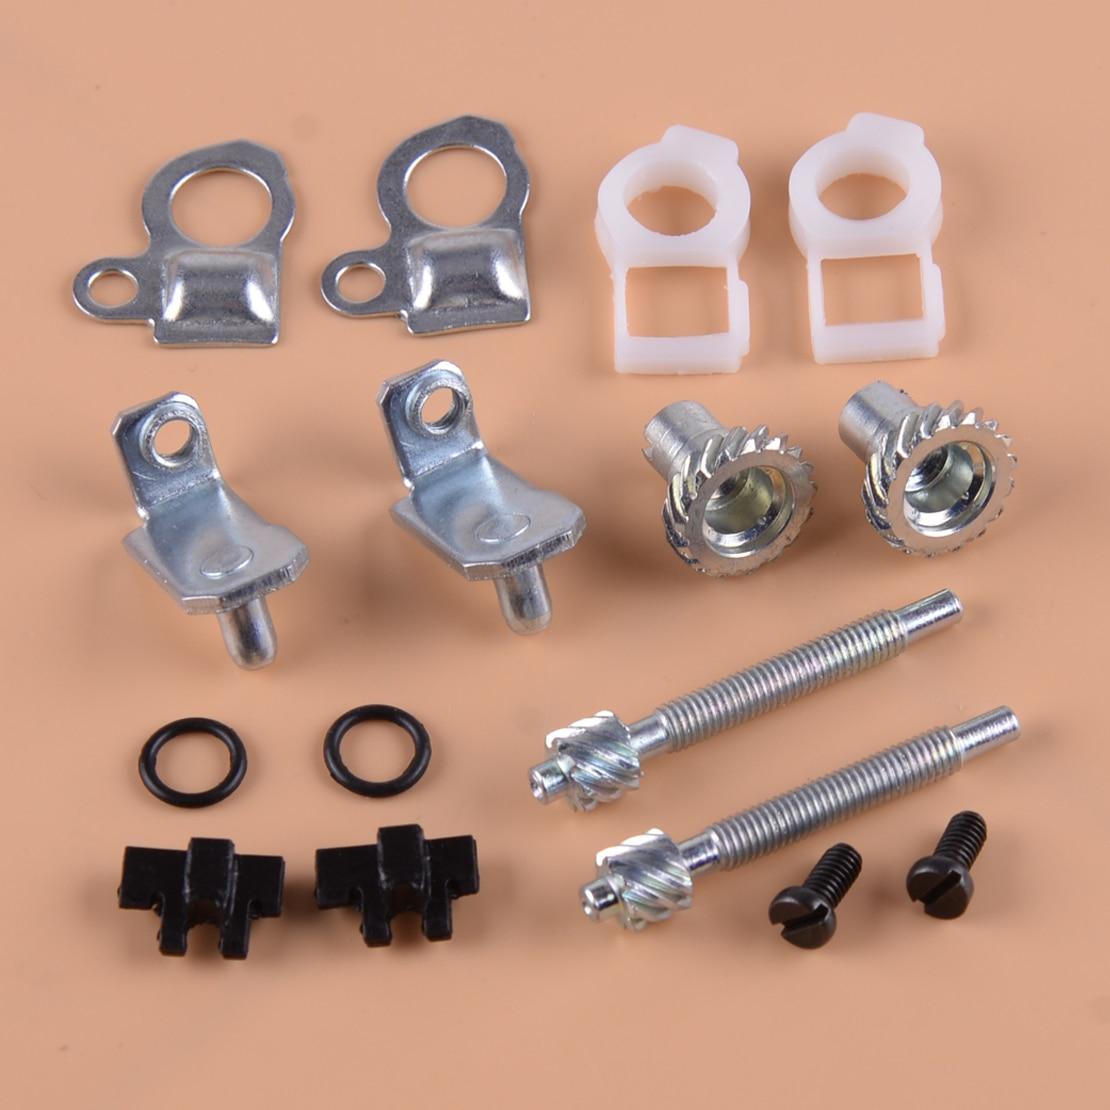 letaosk-2-kit-chain-adjuster-tensioner-kit-fit-for-stihl-ms261-ms280-ms341-ms441-038-ms461